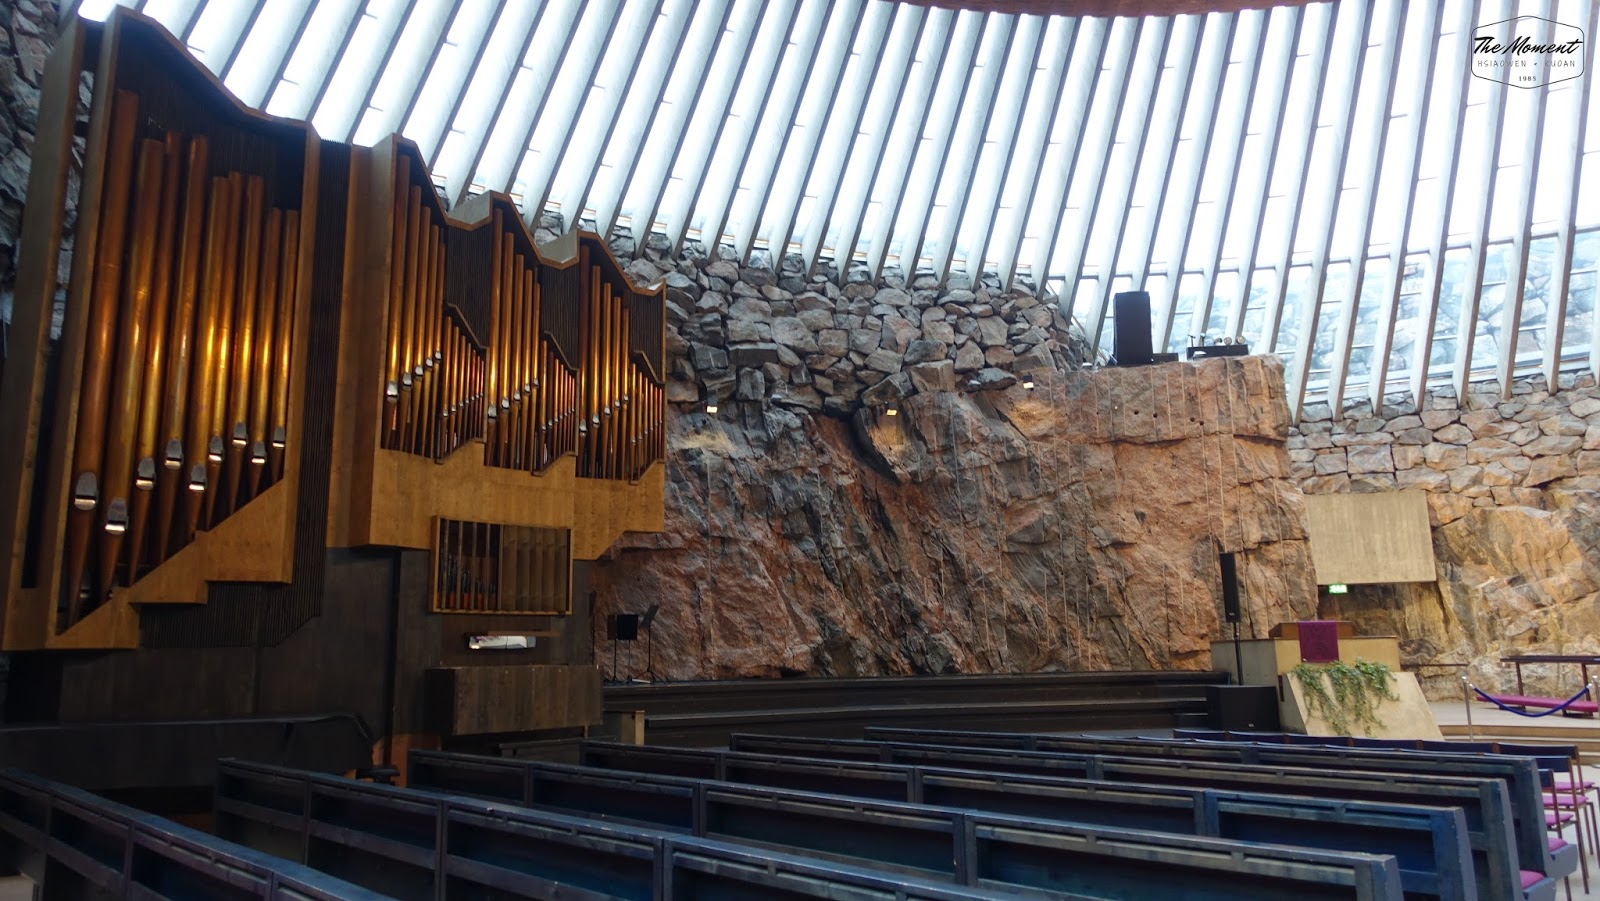 02 Mar 2017 (THU) (Activity) Finland_赫爾辛基Helsinki part 2 Kamppi Chapel&巖石教堂 | The moment